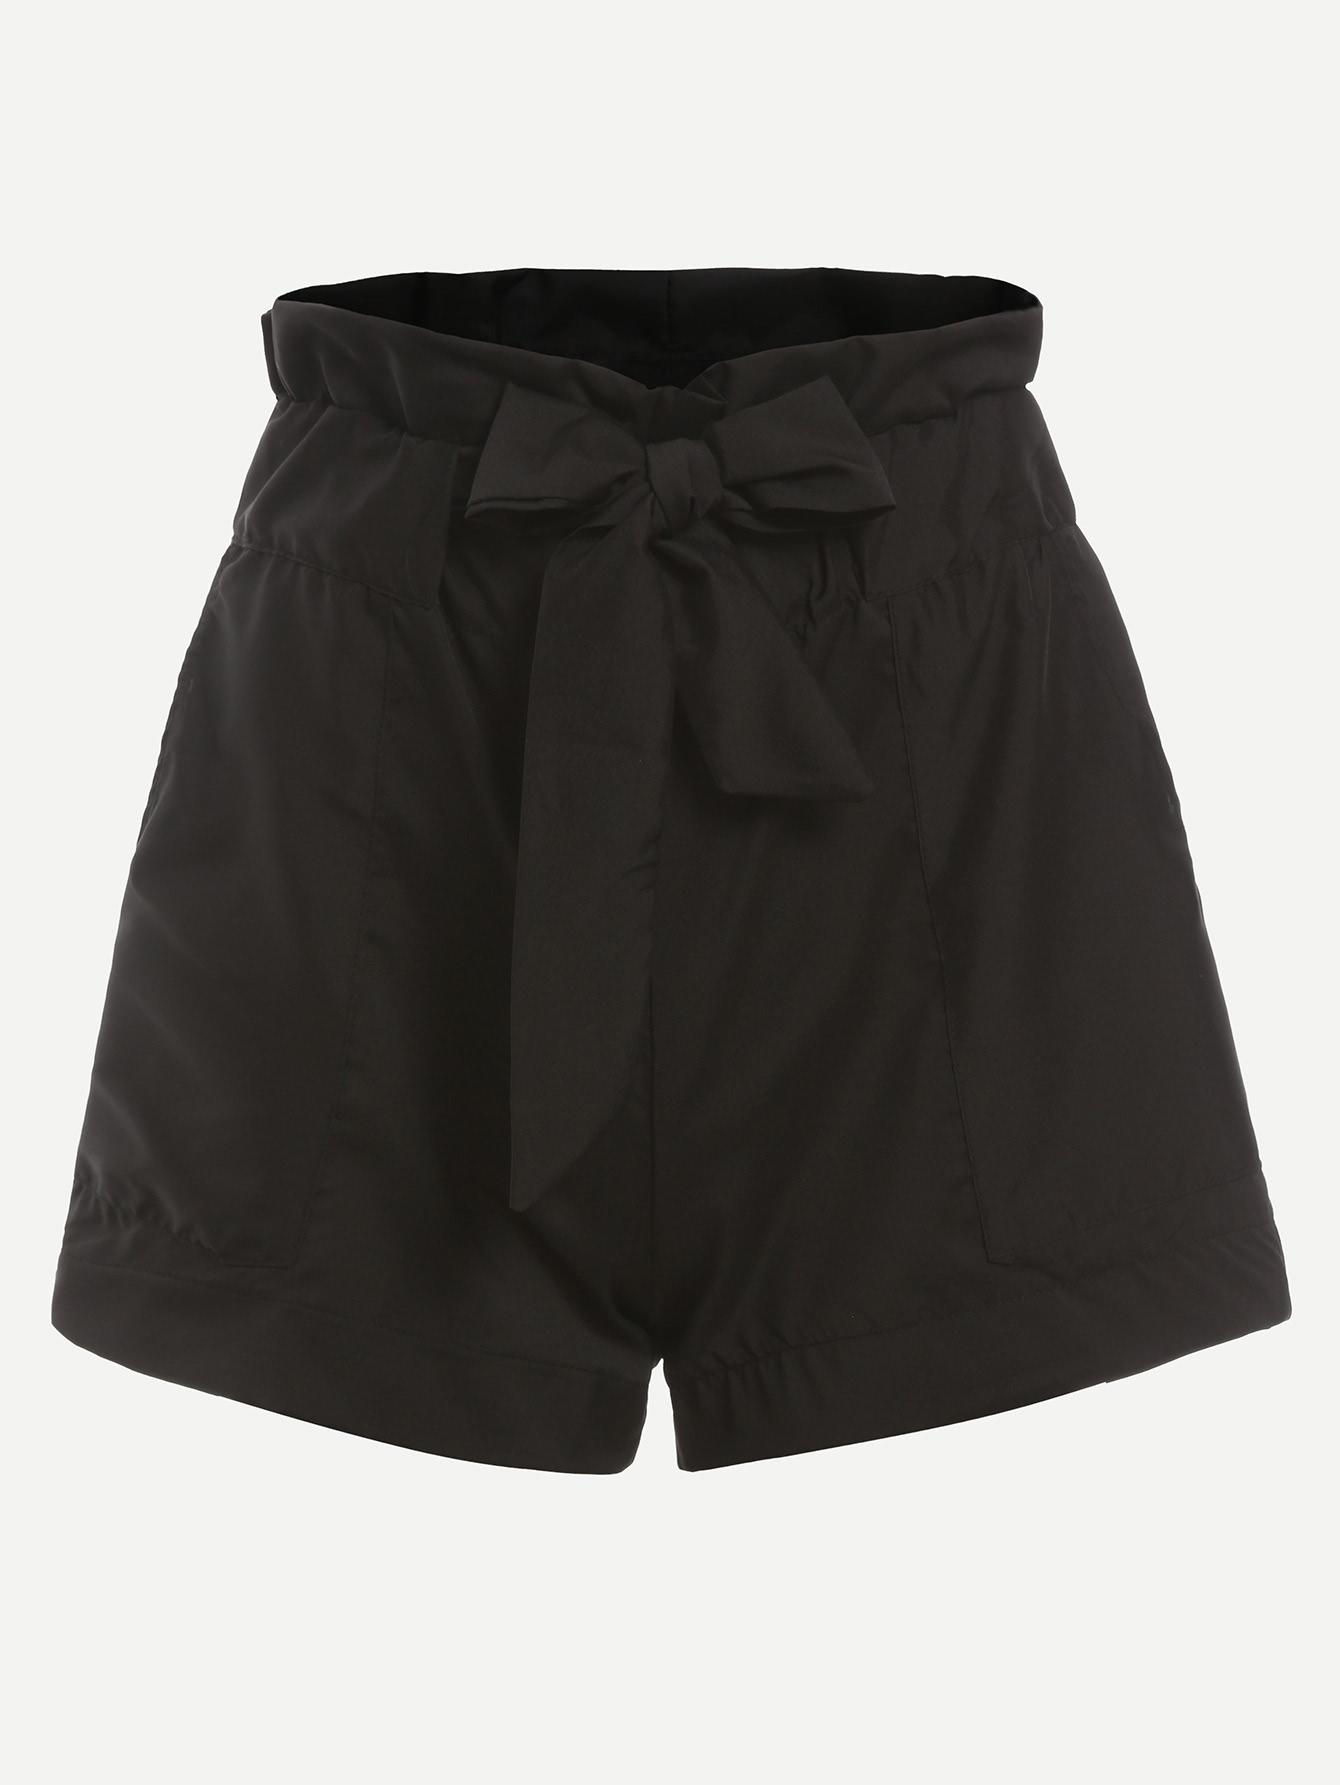 Black Ruffle Waist Self Tie Shorts